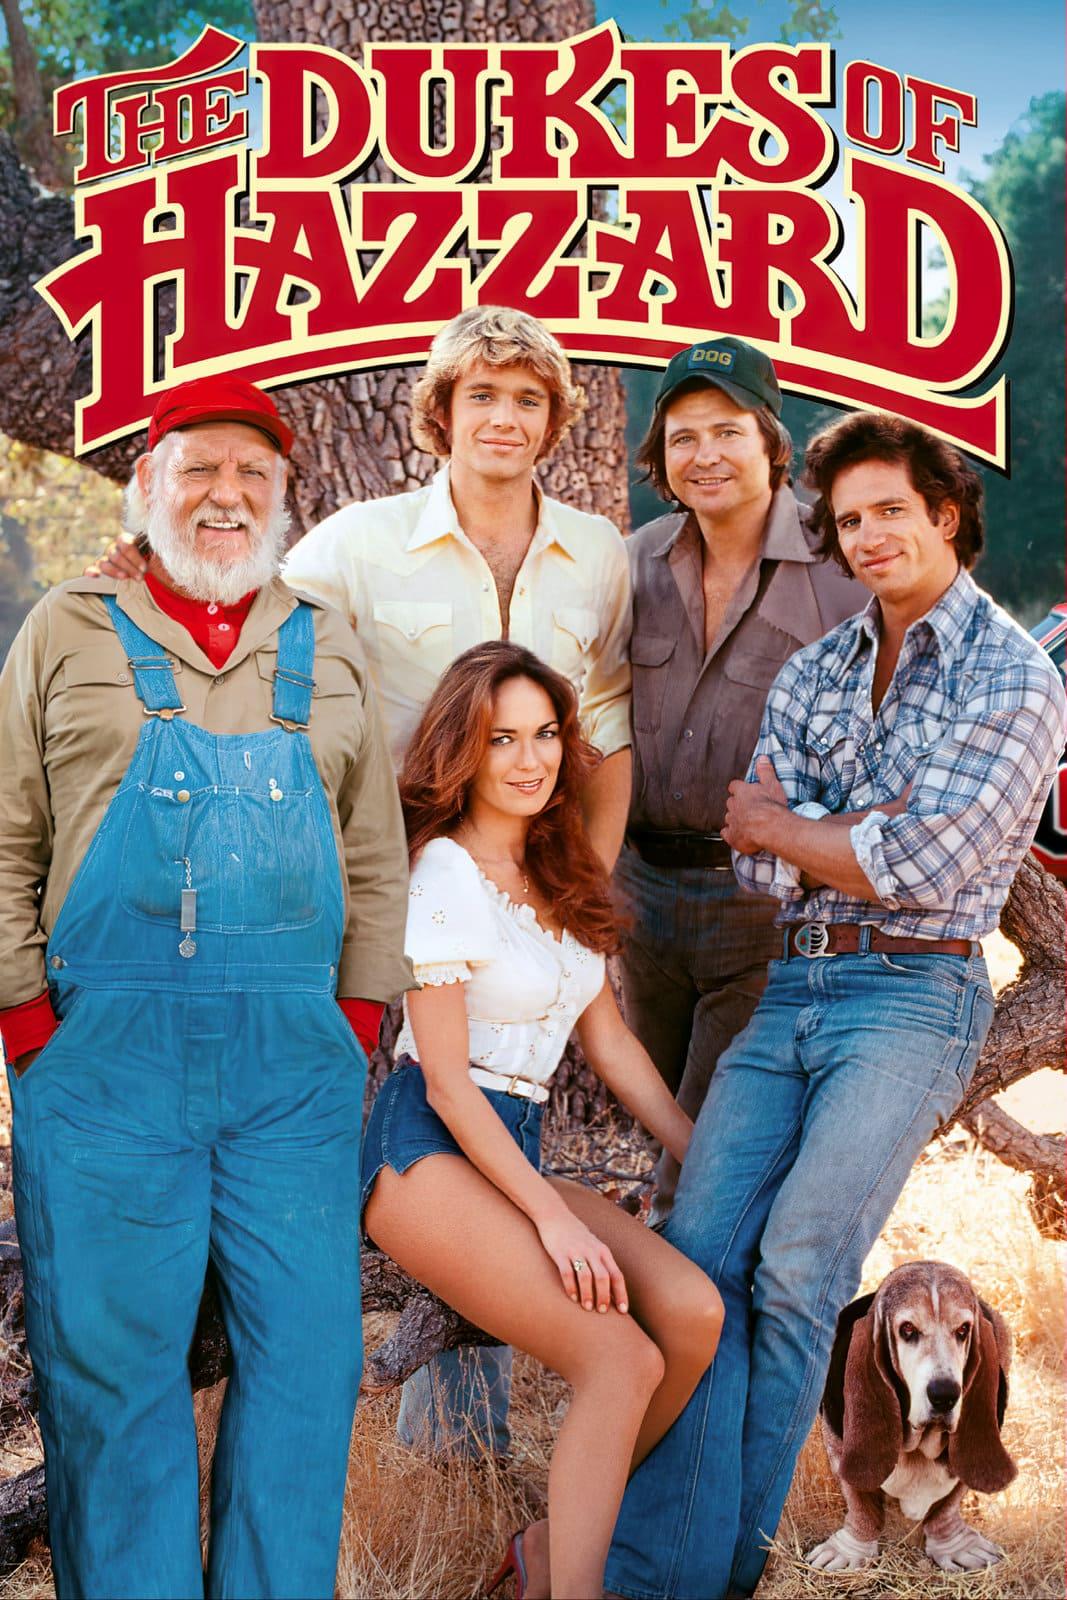 Dukes of Hazzard DVD cover